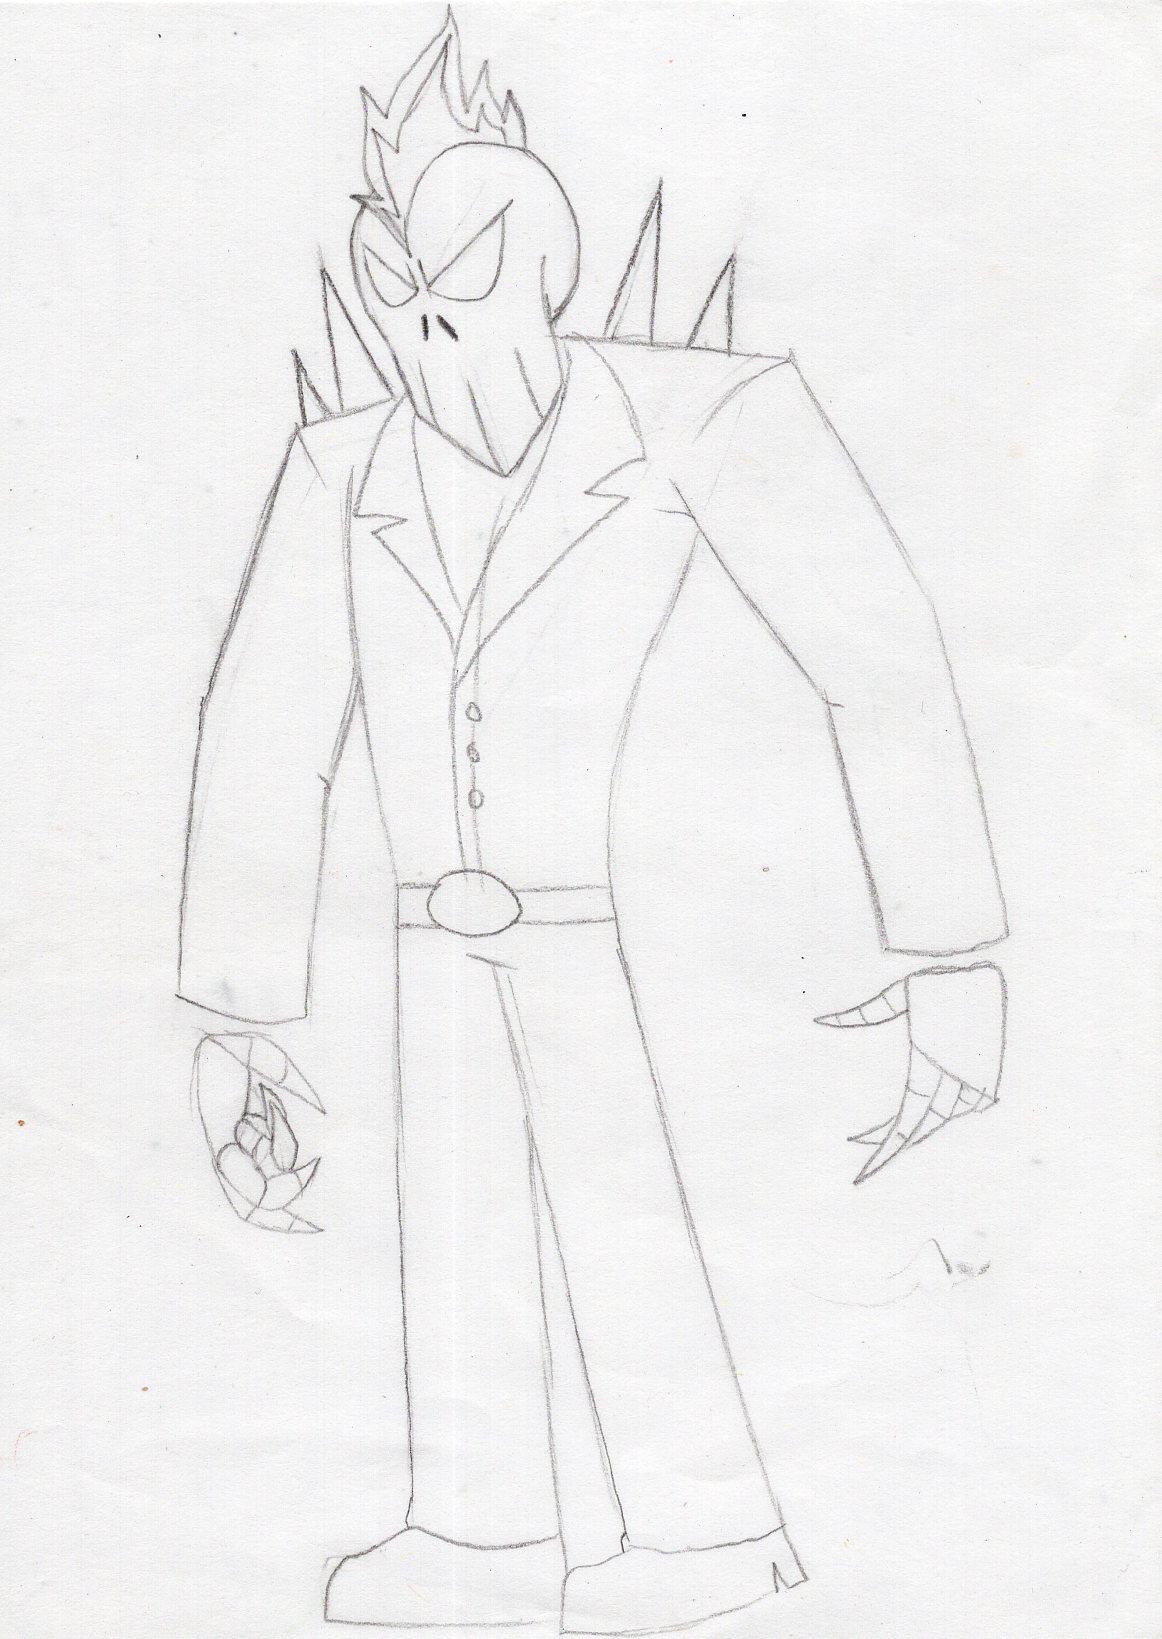 71dff888aab26 old Ghost design doodle 2 by Yojama on DeviantArt